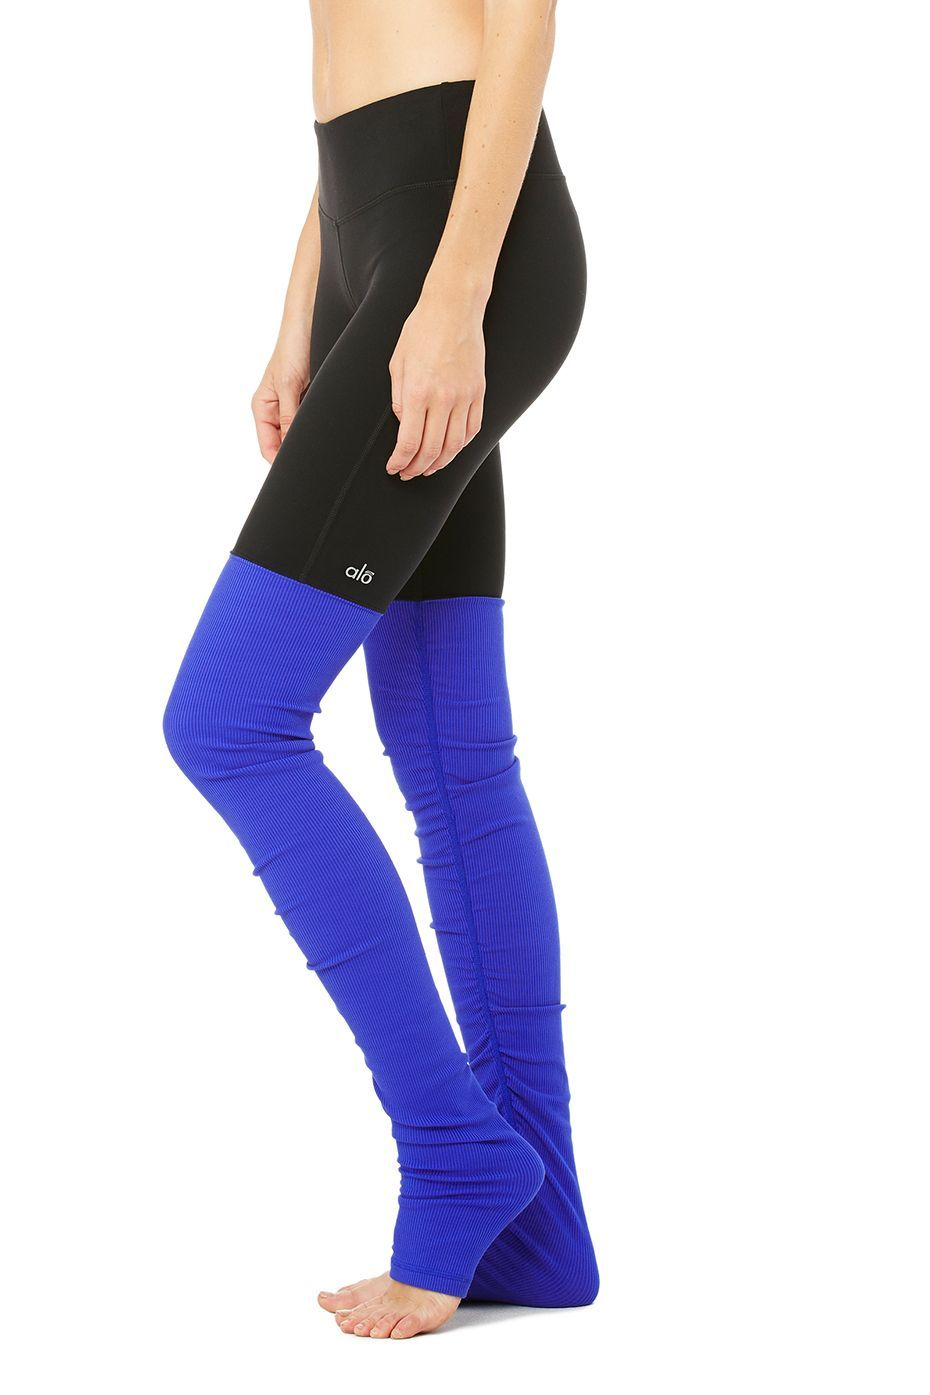 "Goddess Legging - Black/Deep Electric Blue - Sale Bottoms - <span class=""text-danger"">Sale</span> at ALO Yoga"